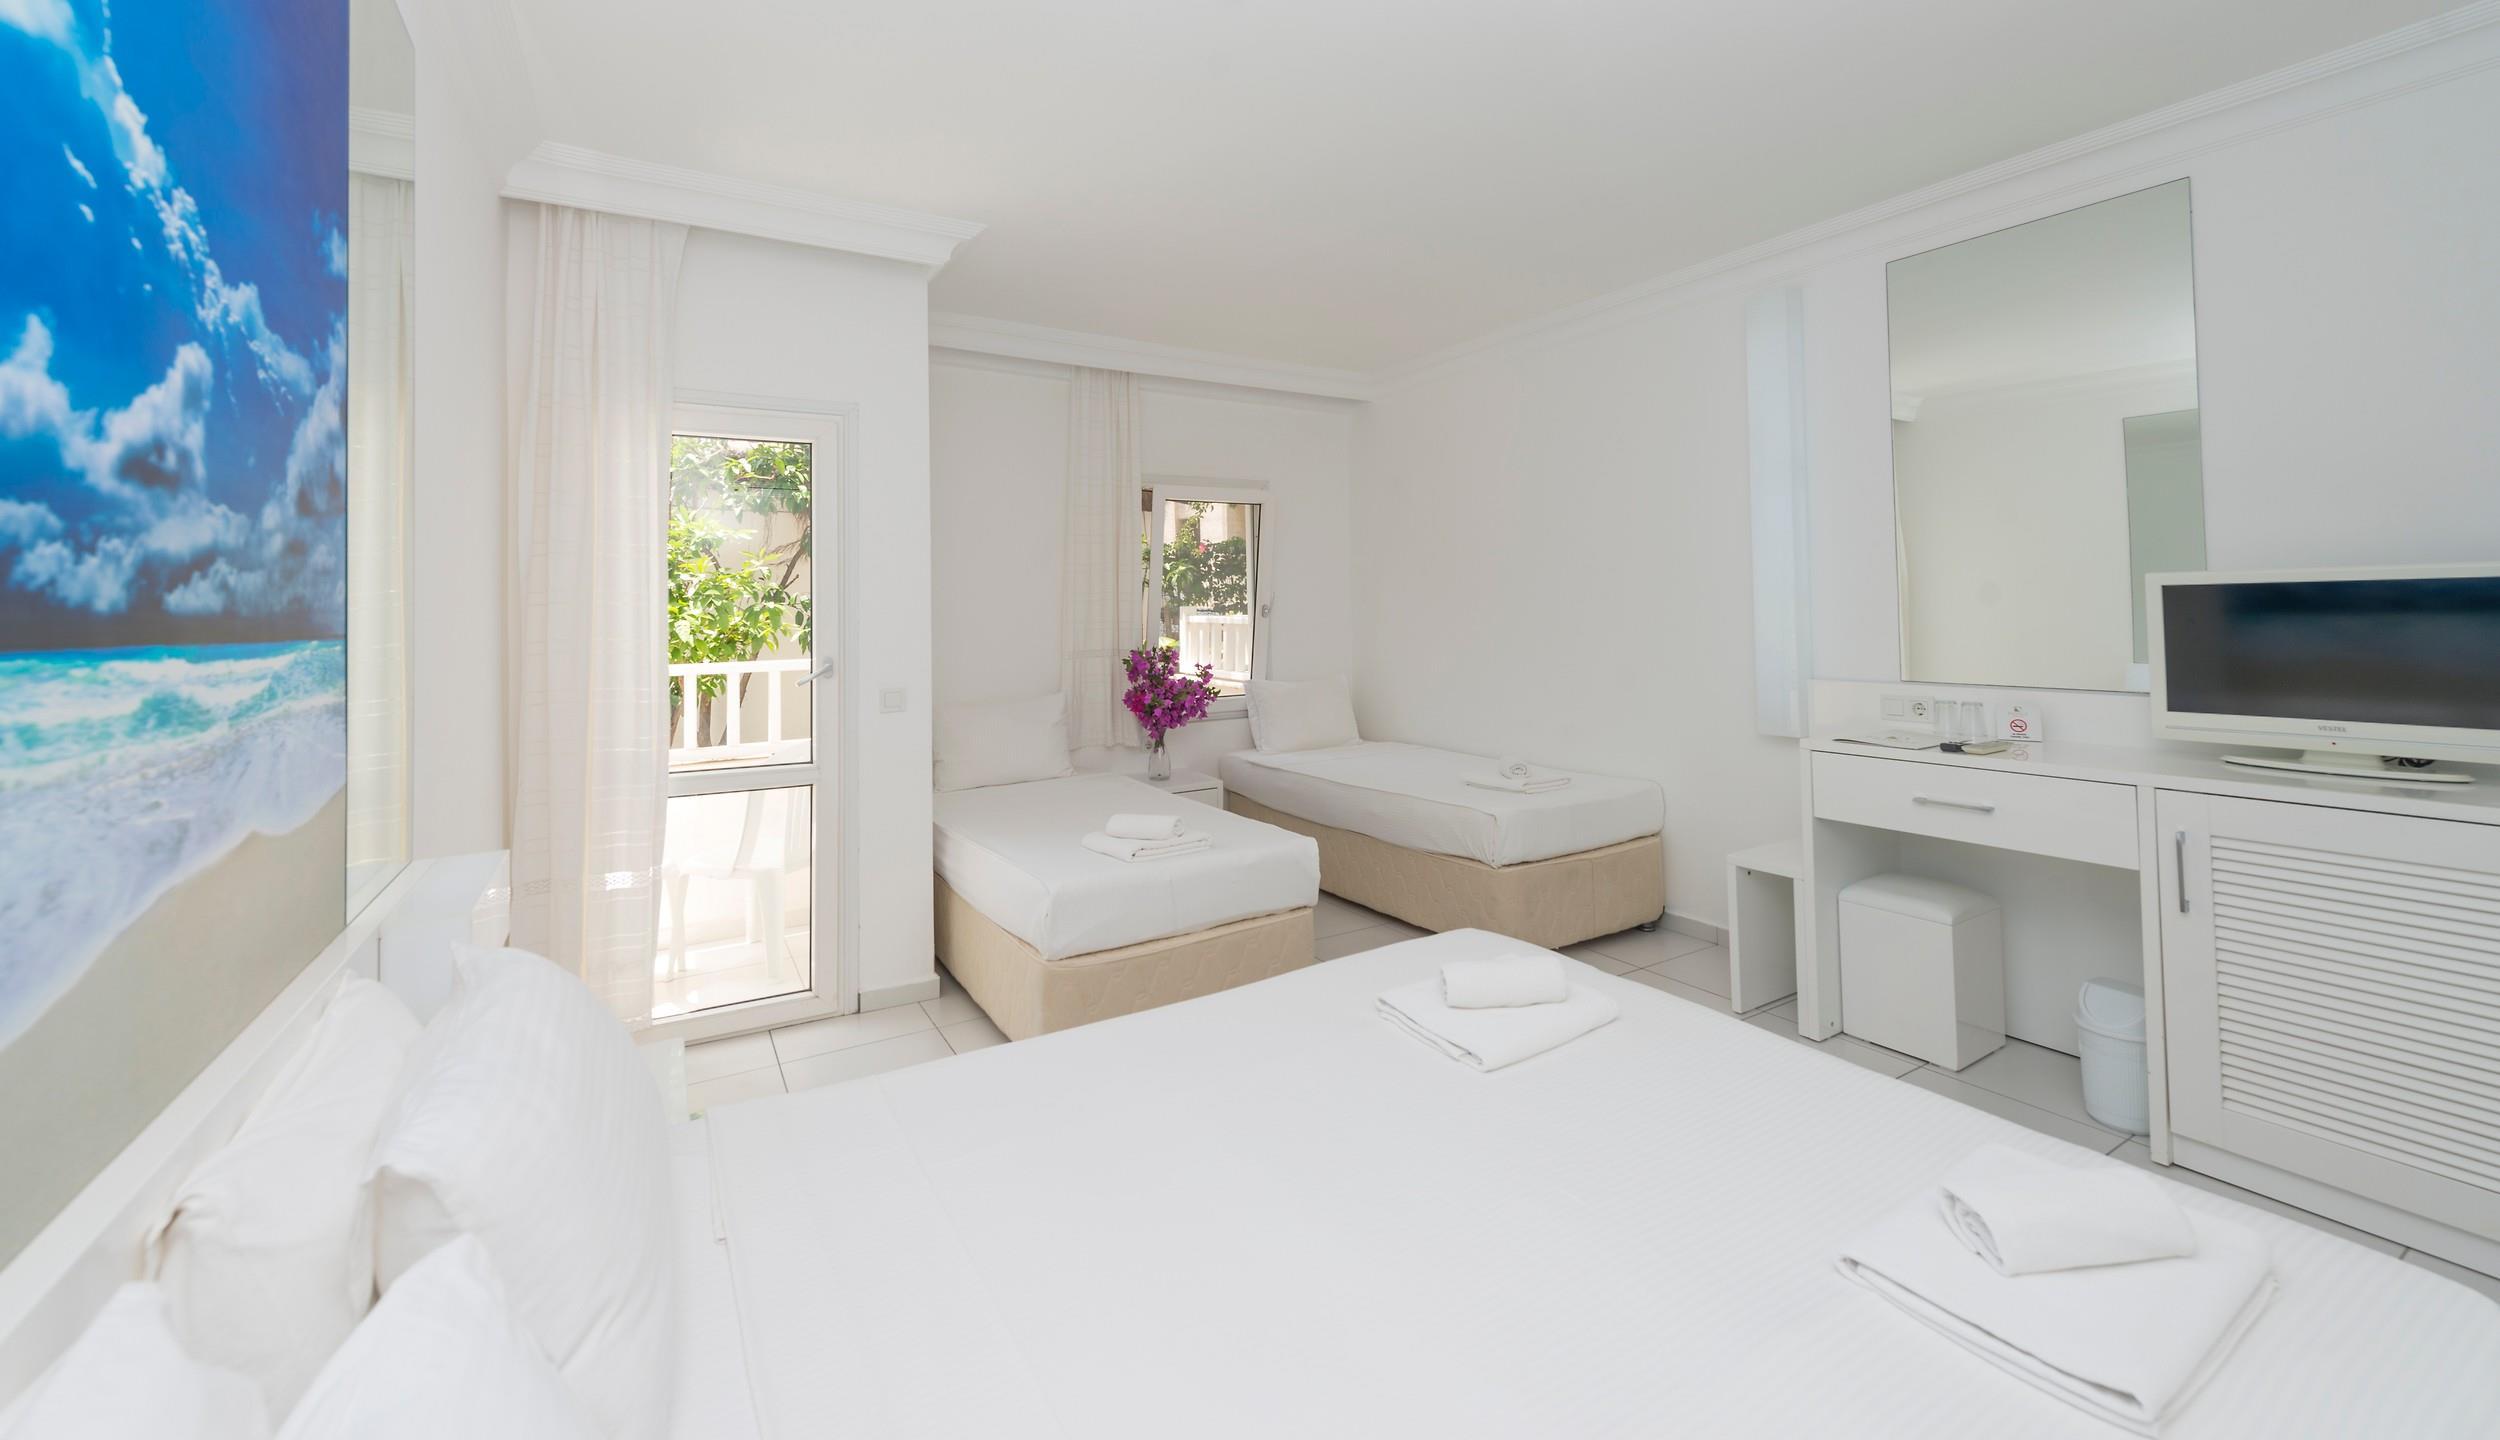 bendis-beach-hotel-genel-013